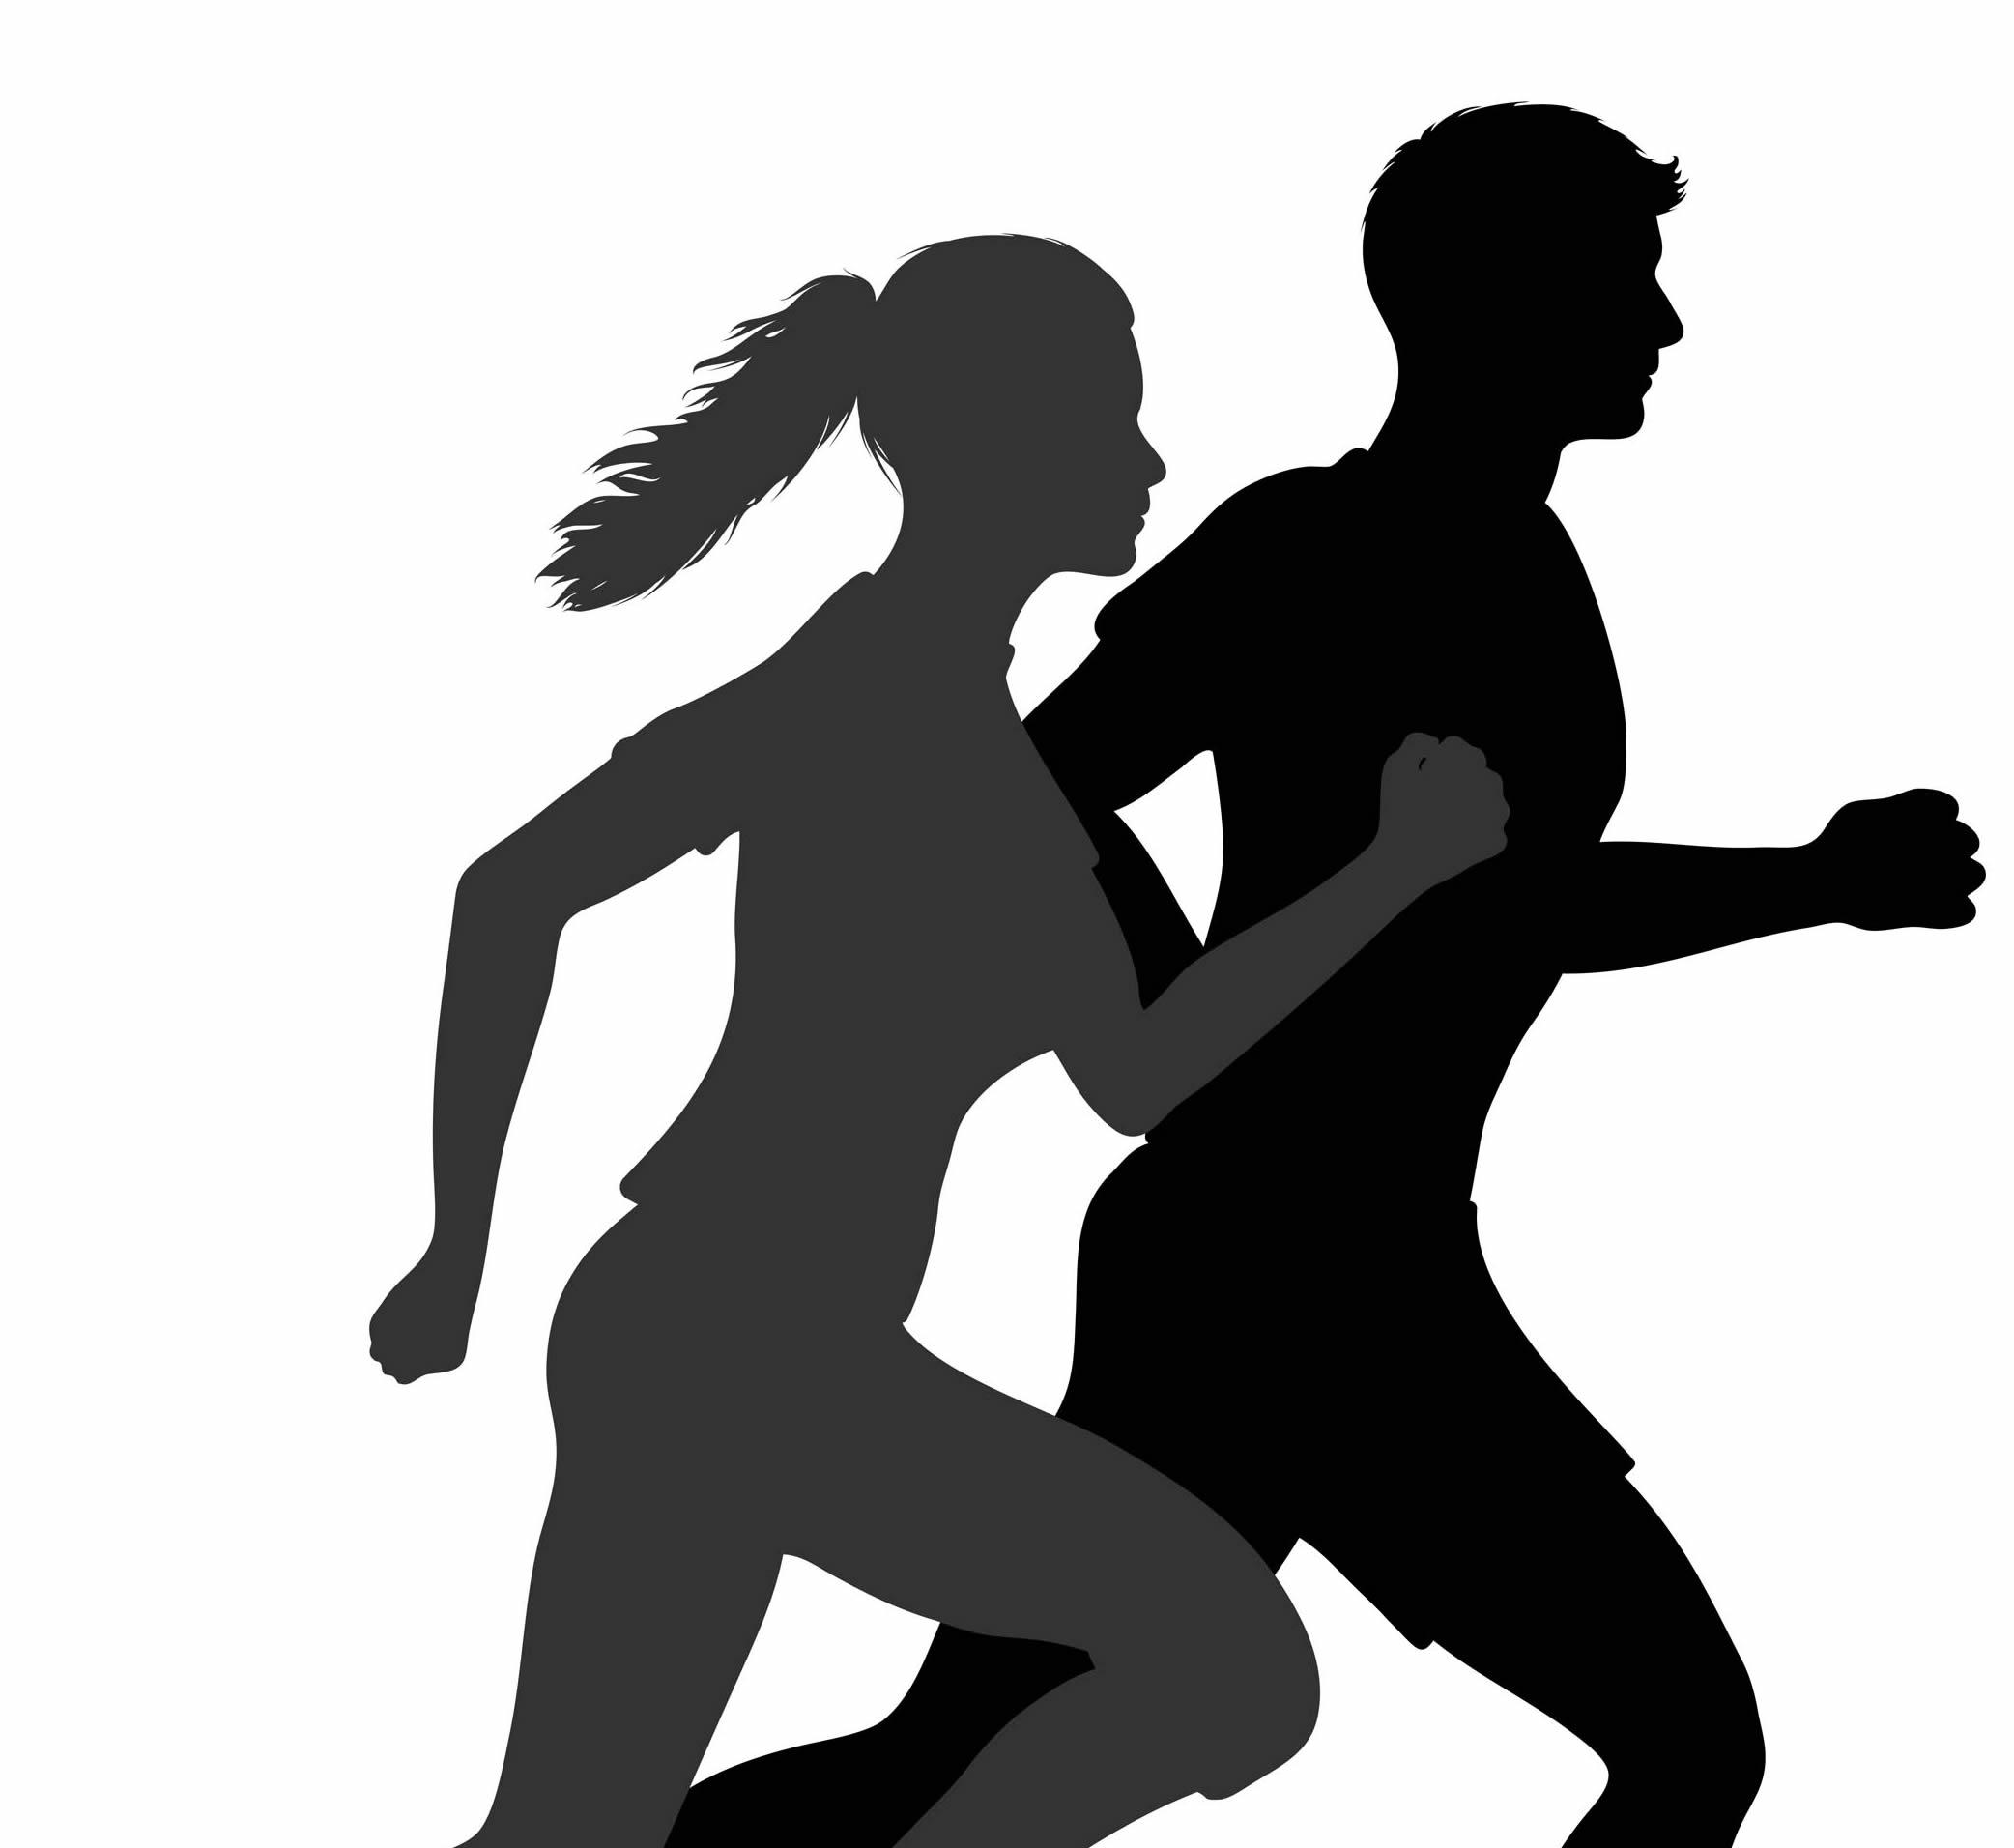 Art of runners jogging.